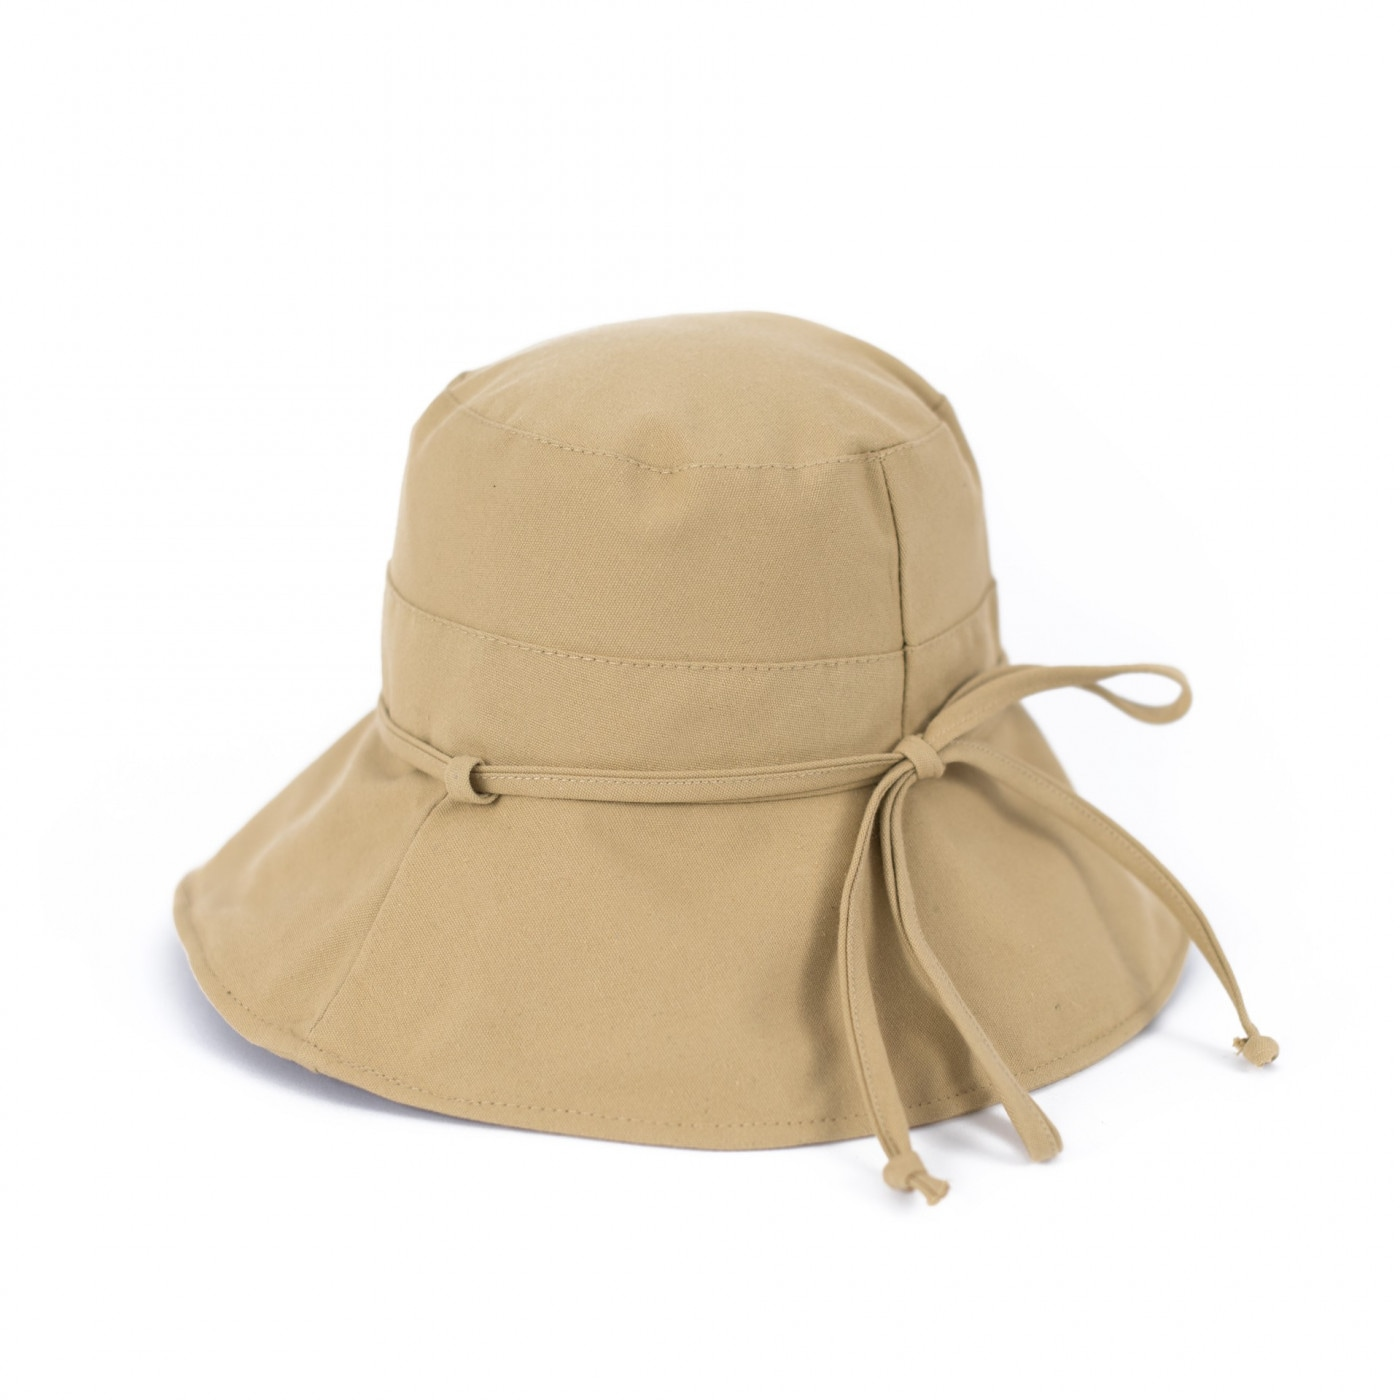 Art Of Polo Woman's Hat cz19127 Dark